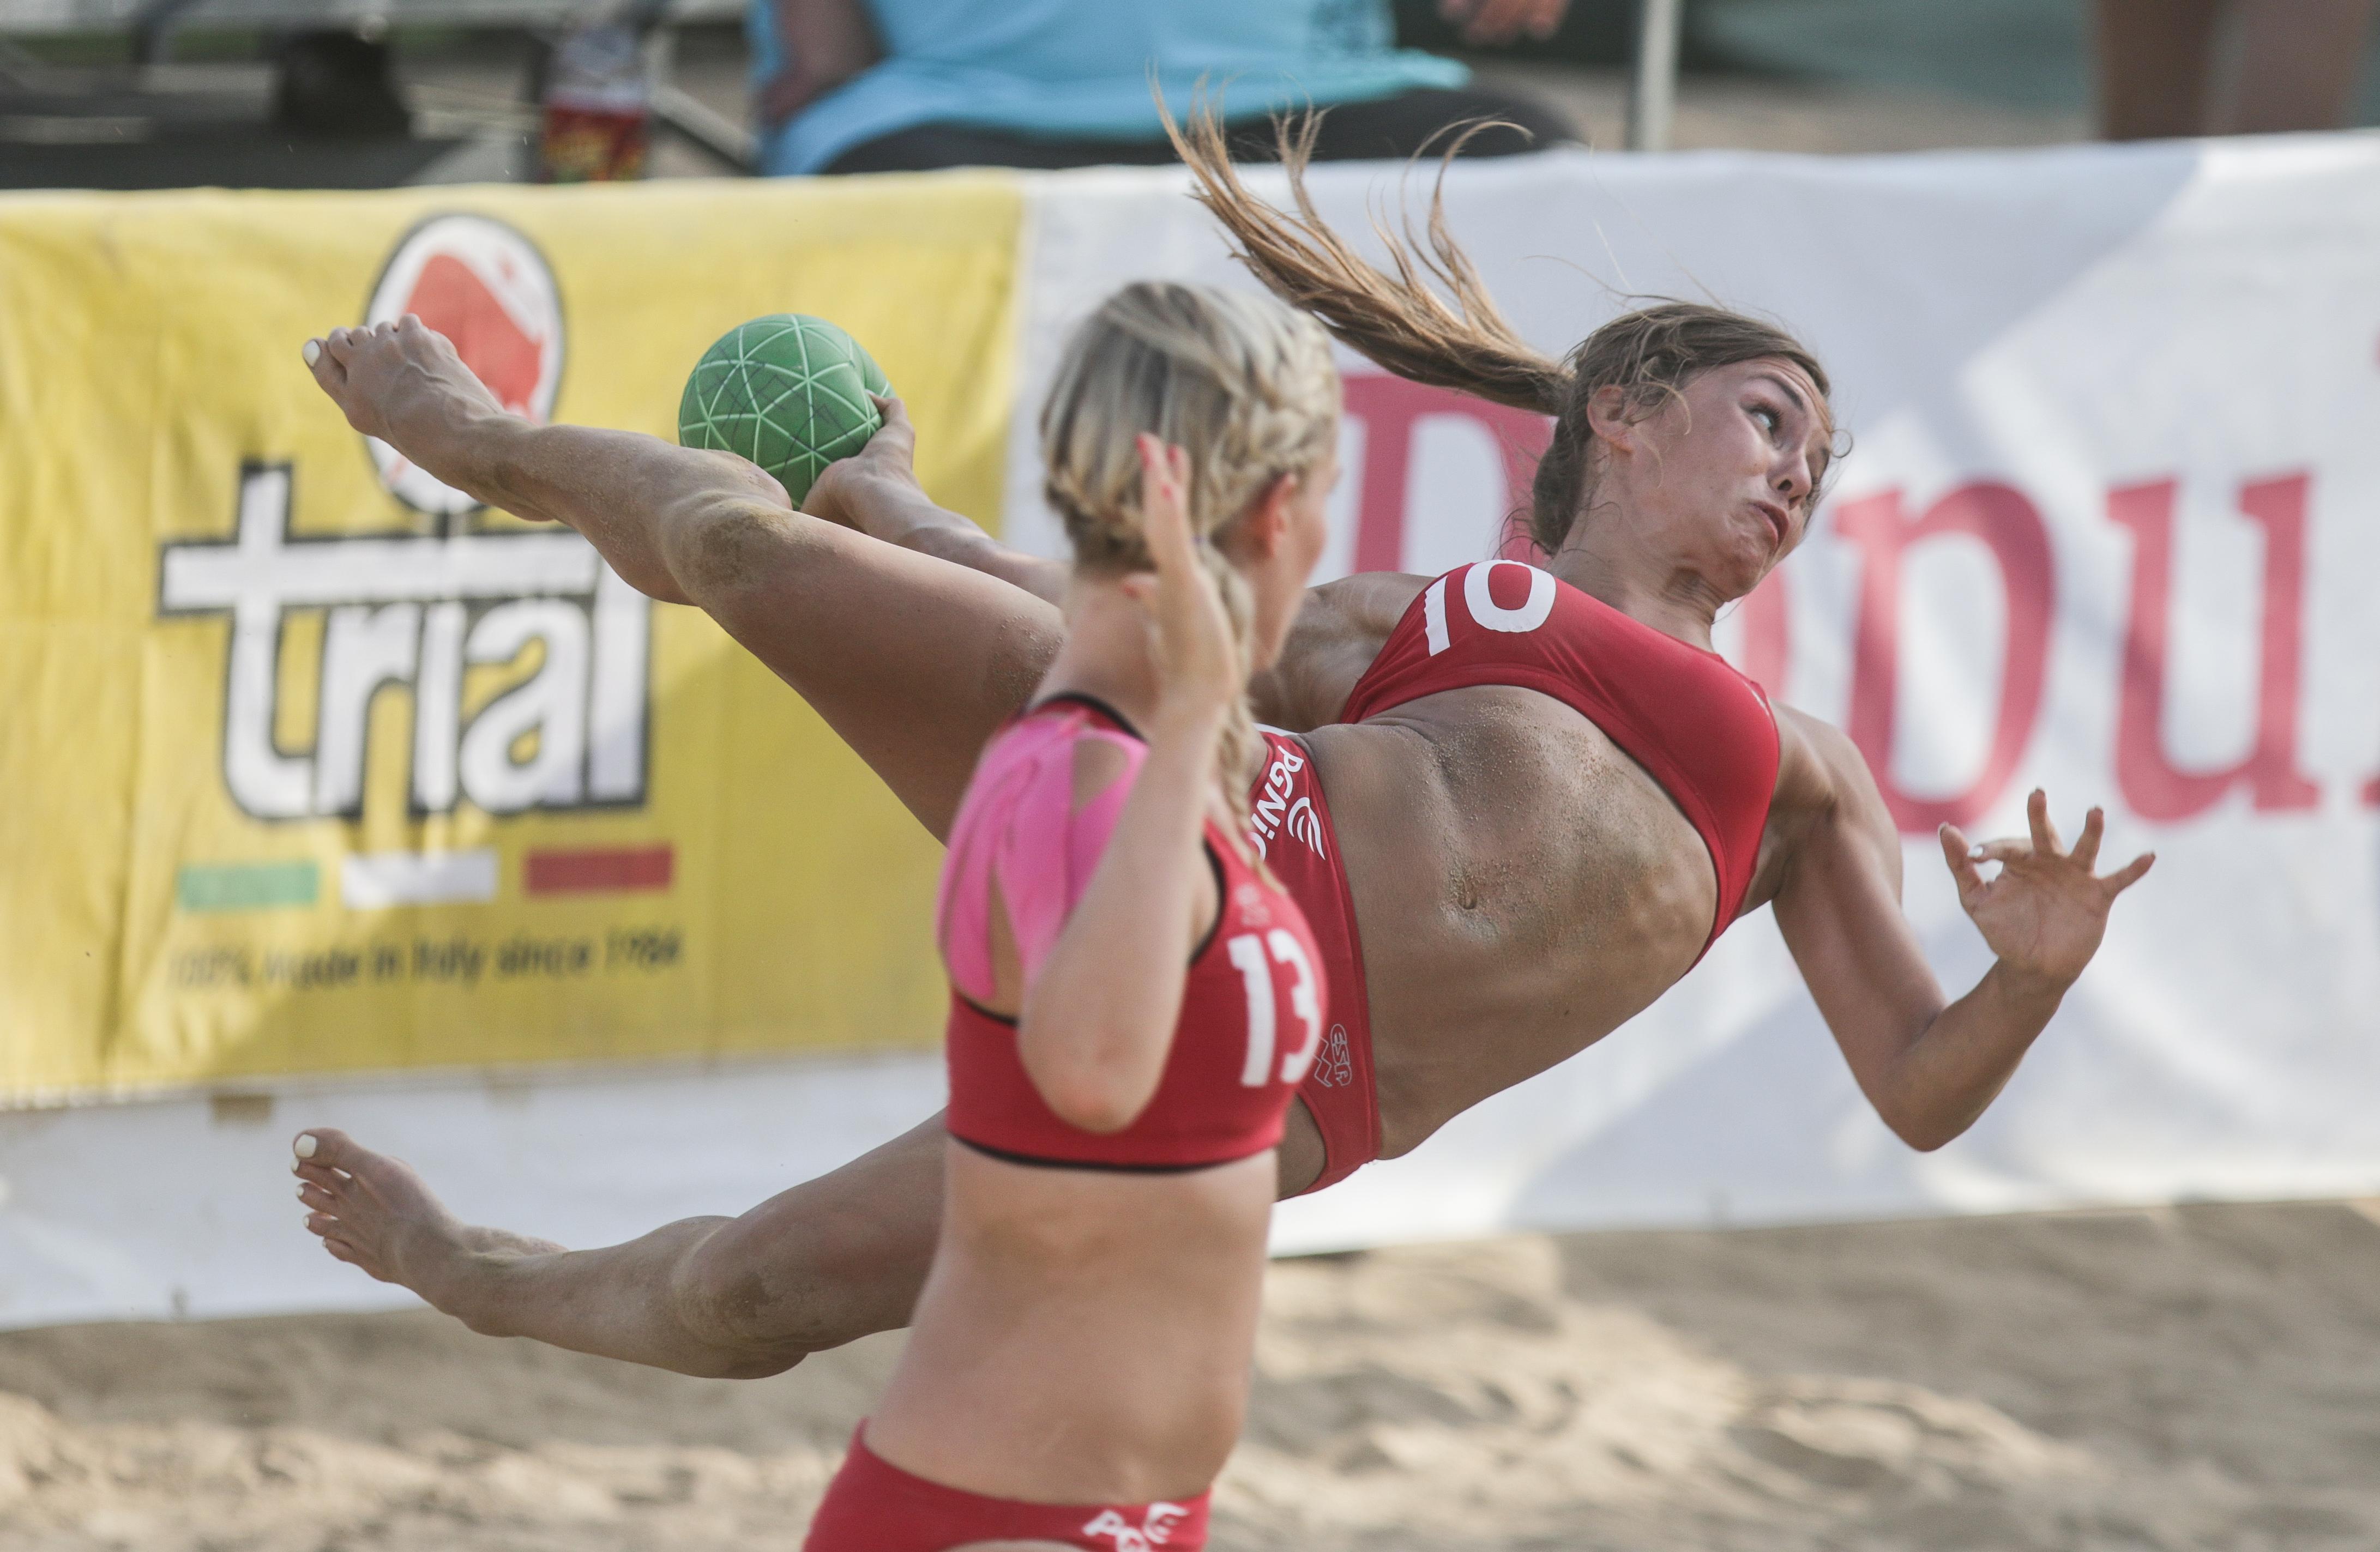 Beach Handball Euro 2015 Lloret de Mar / Spain